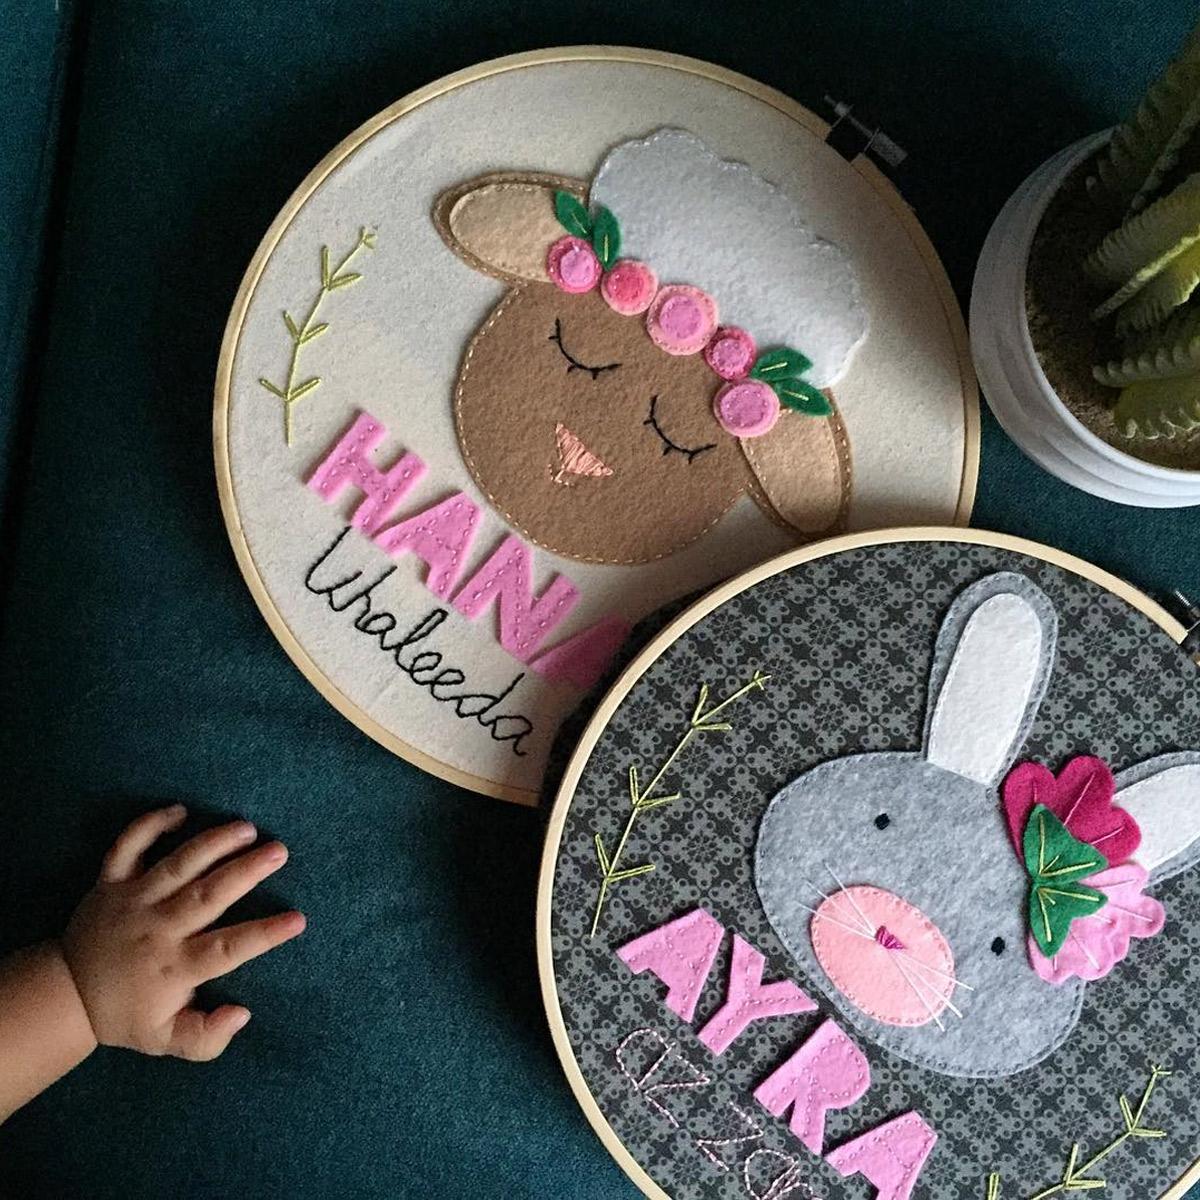 Hoop Art: Embroidery and Felt